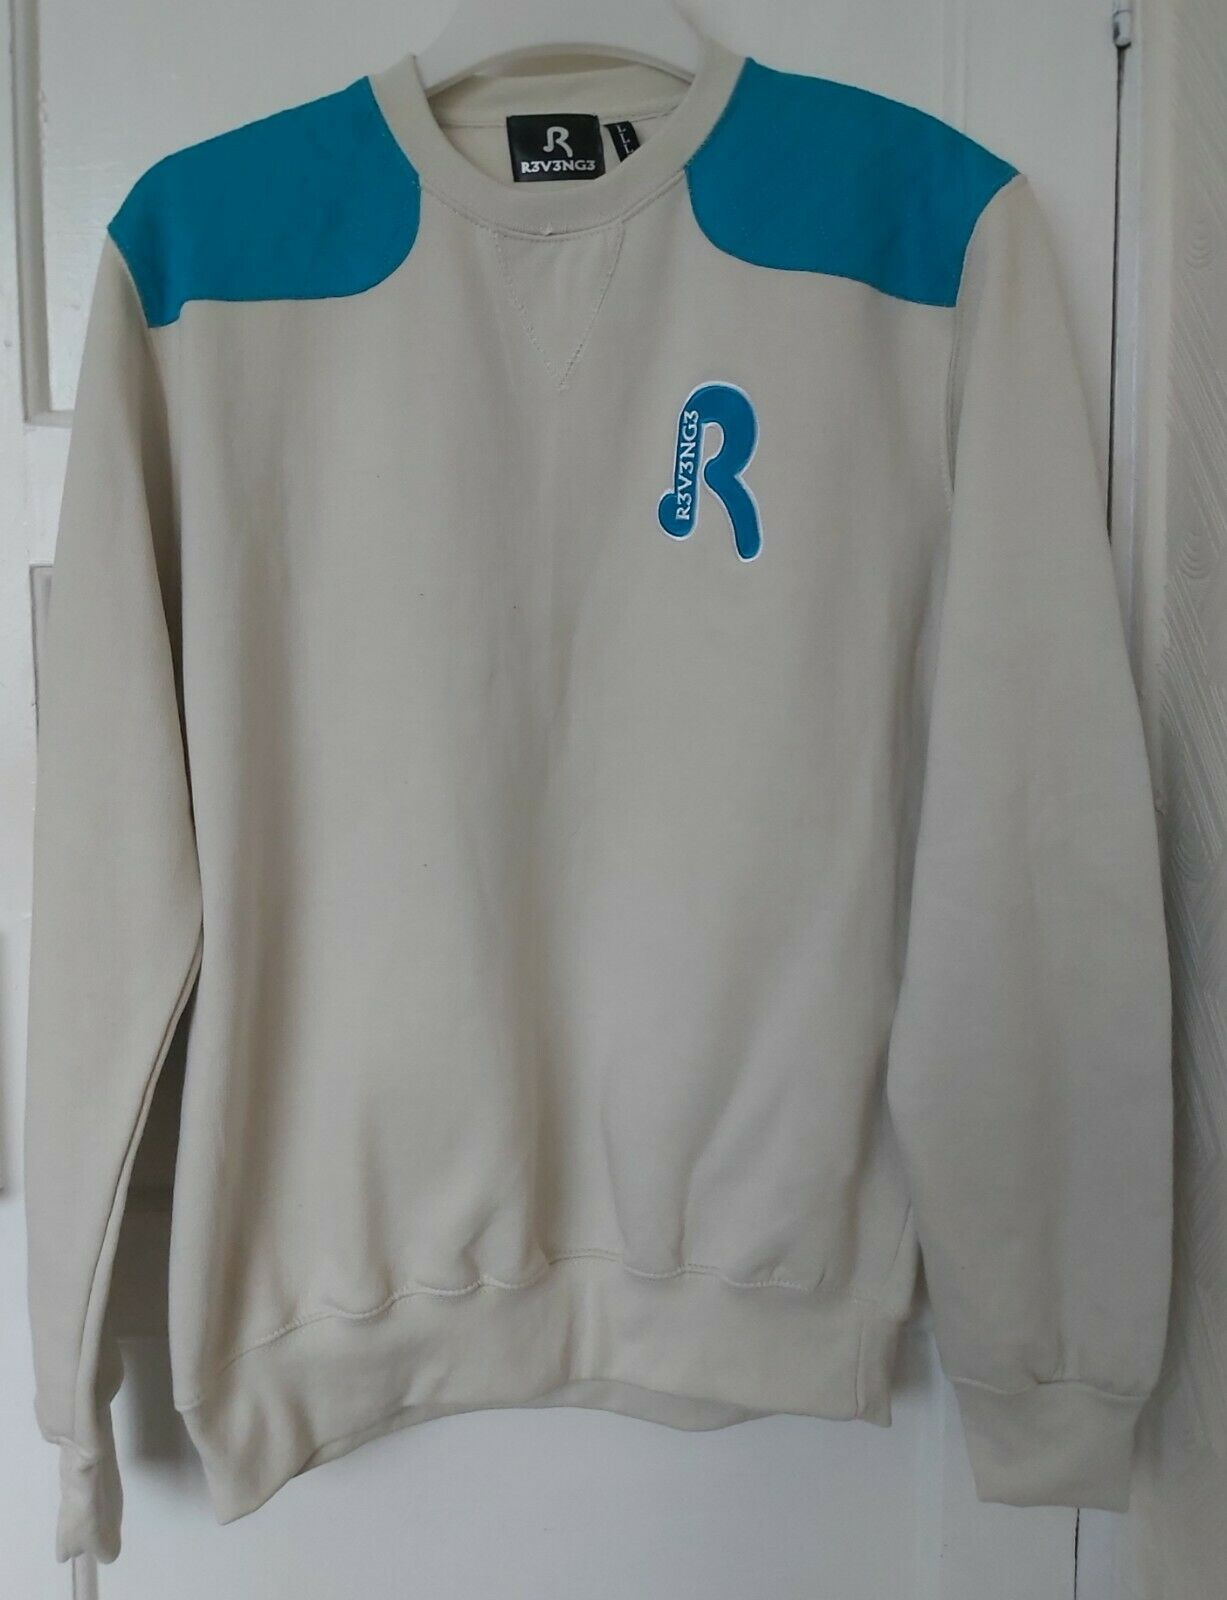 Mens Revenge Tracksuit Large sportswear active casual formal